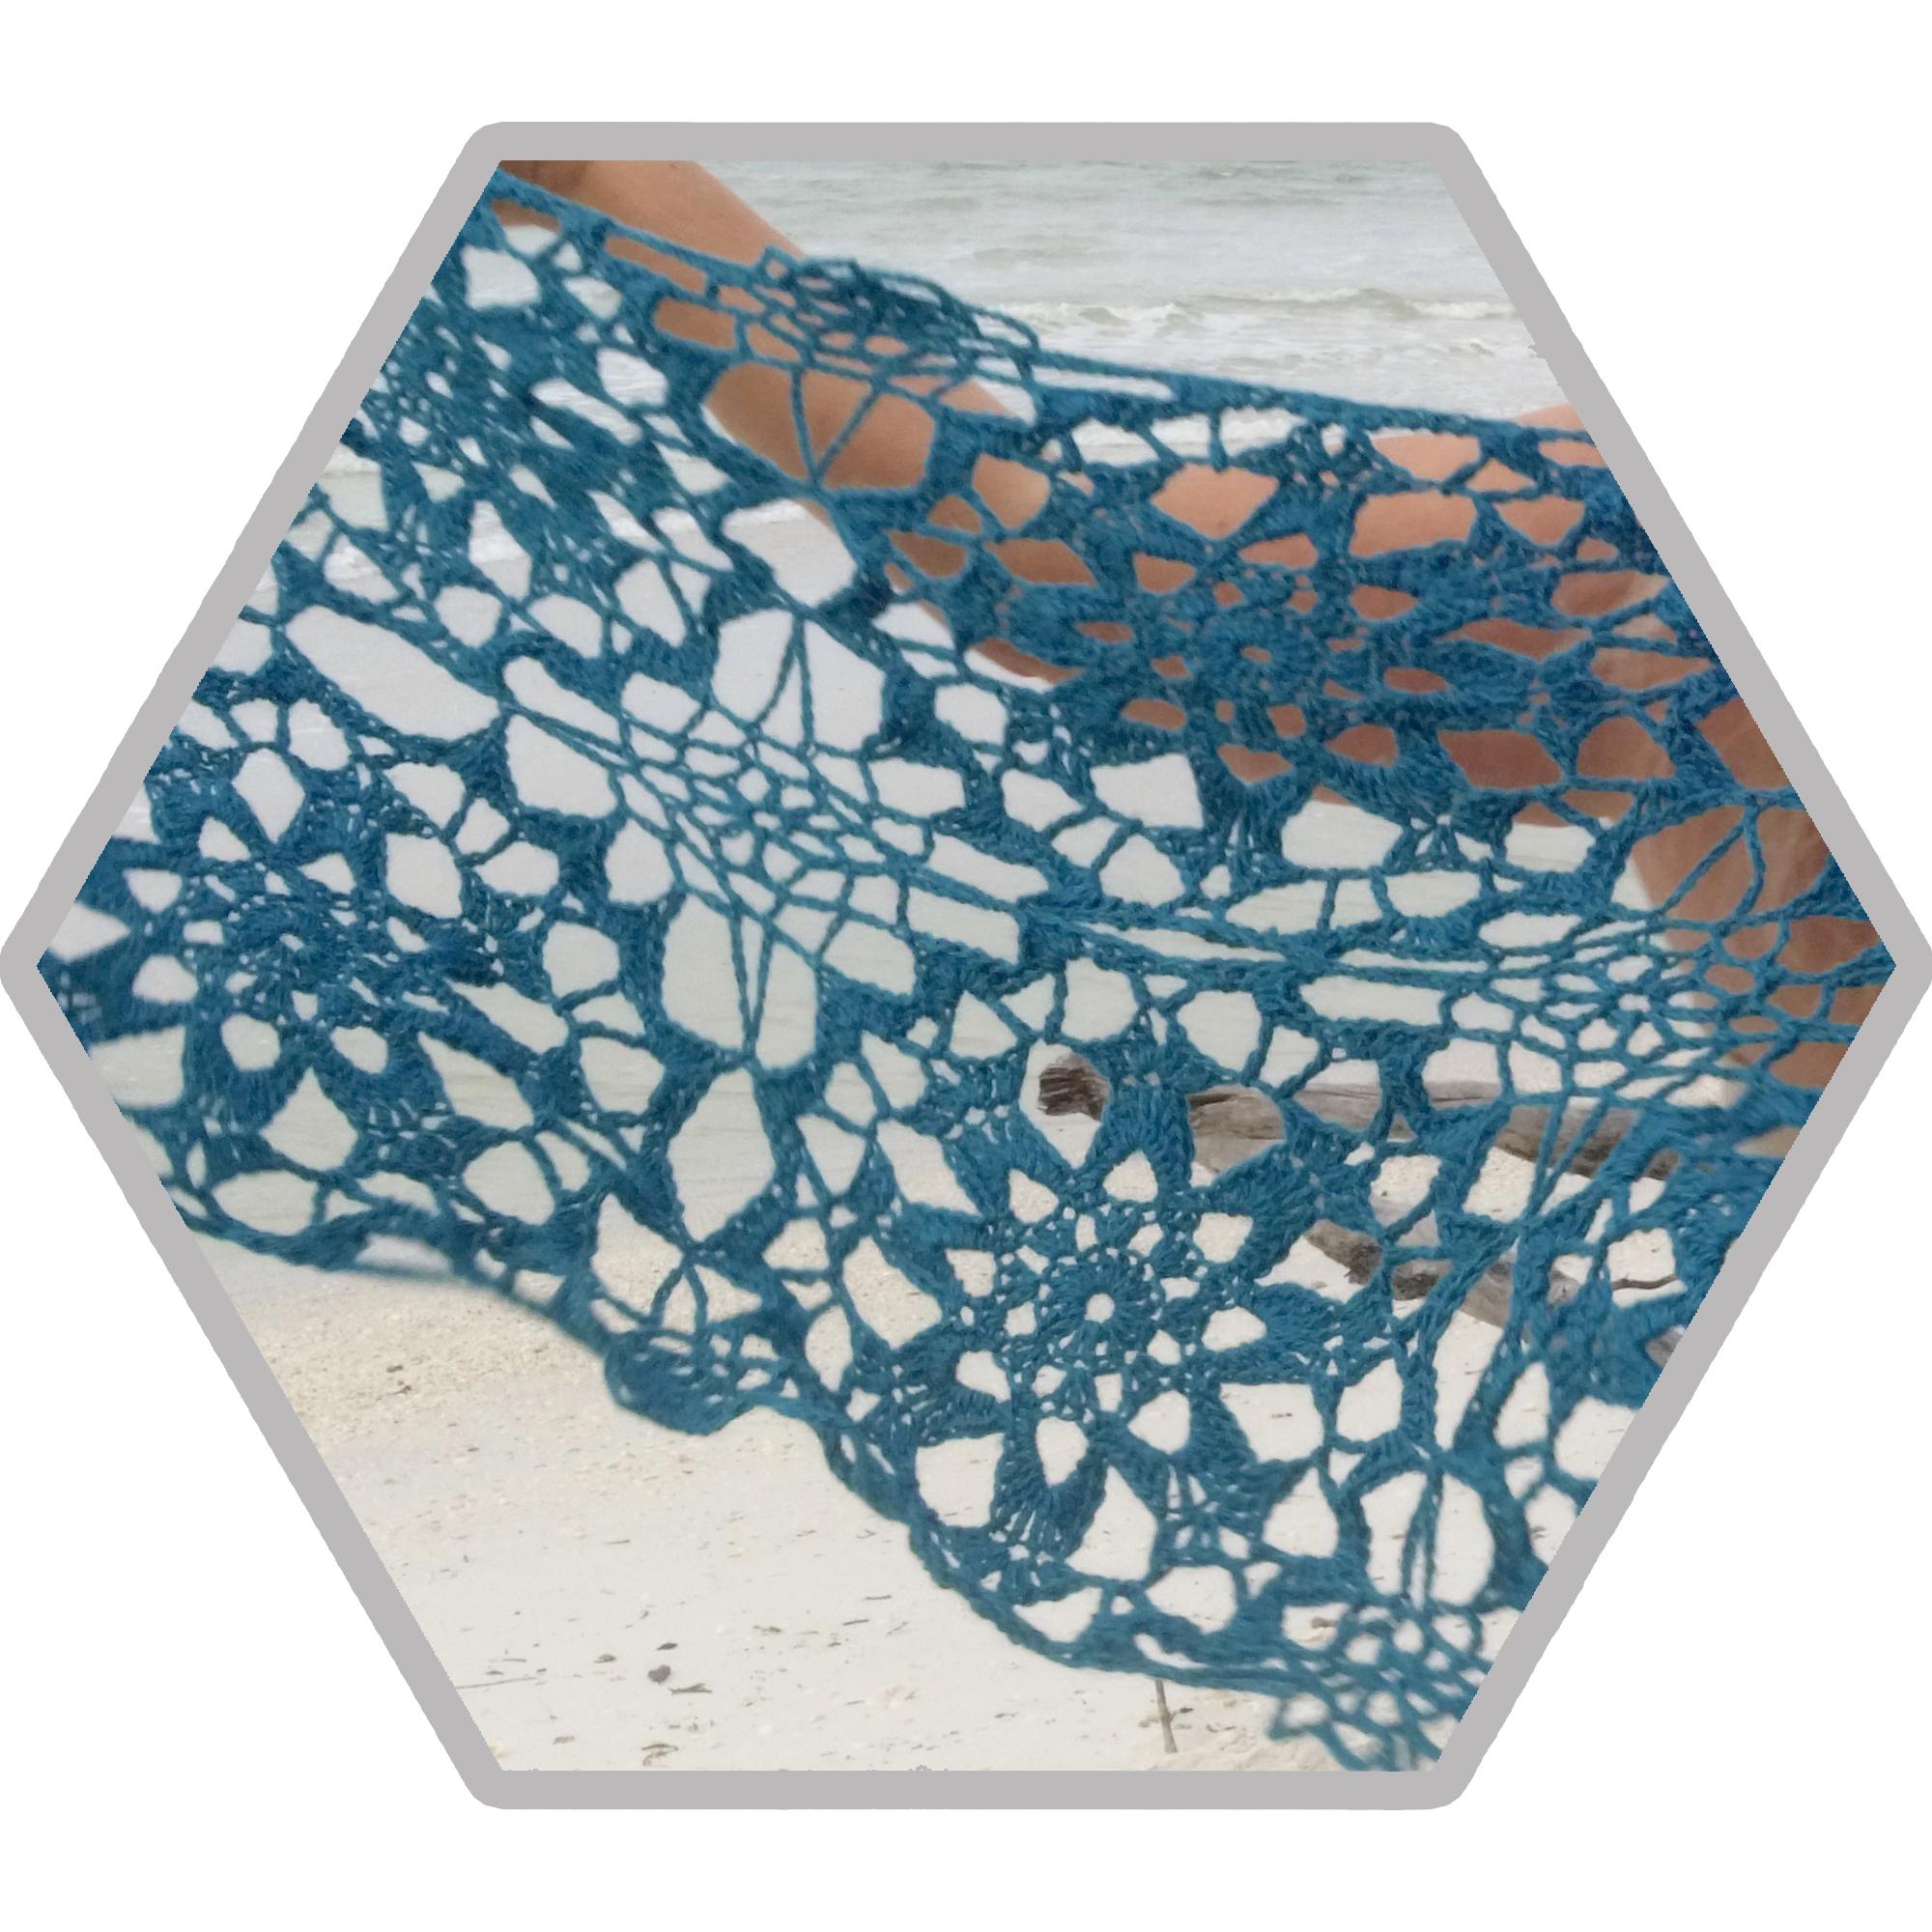 Doreen hexagon.jpg